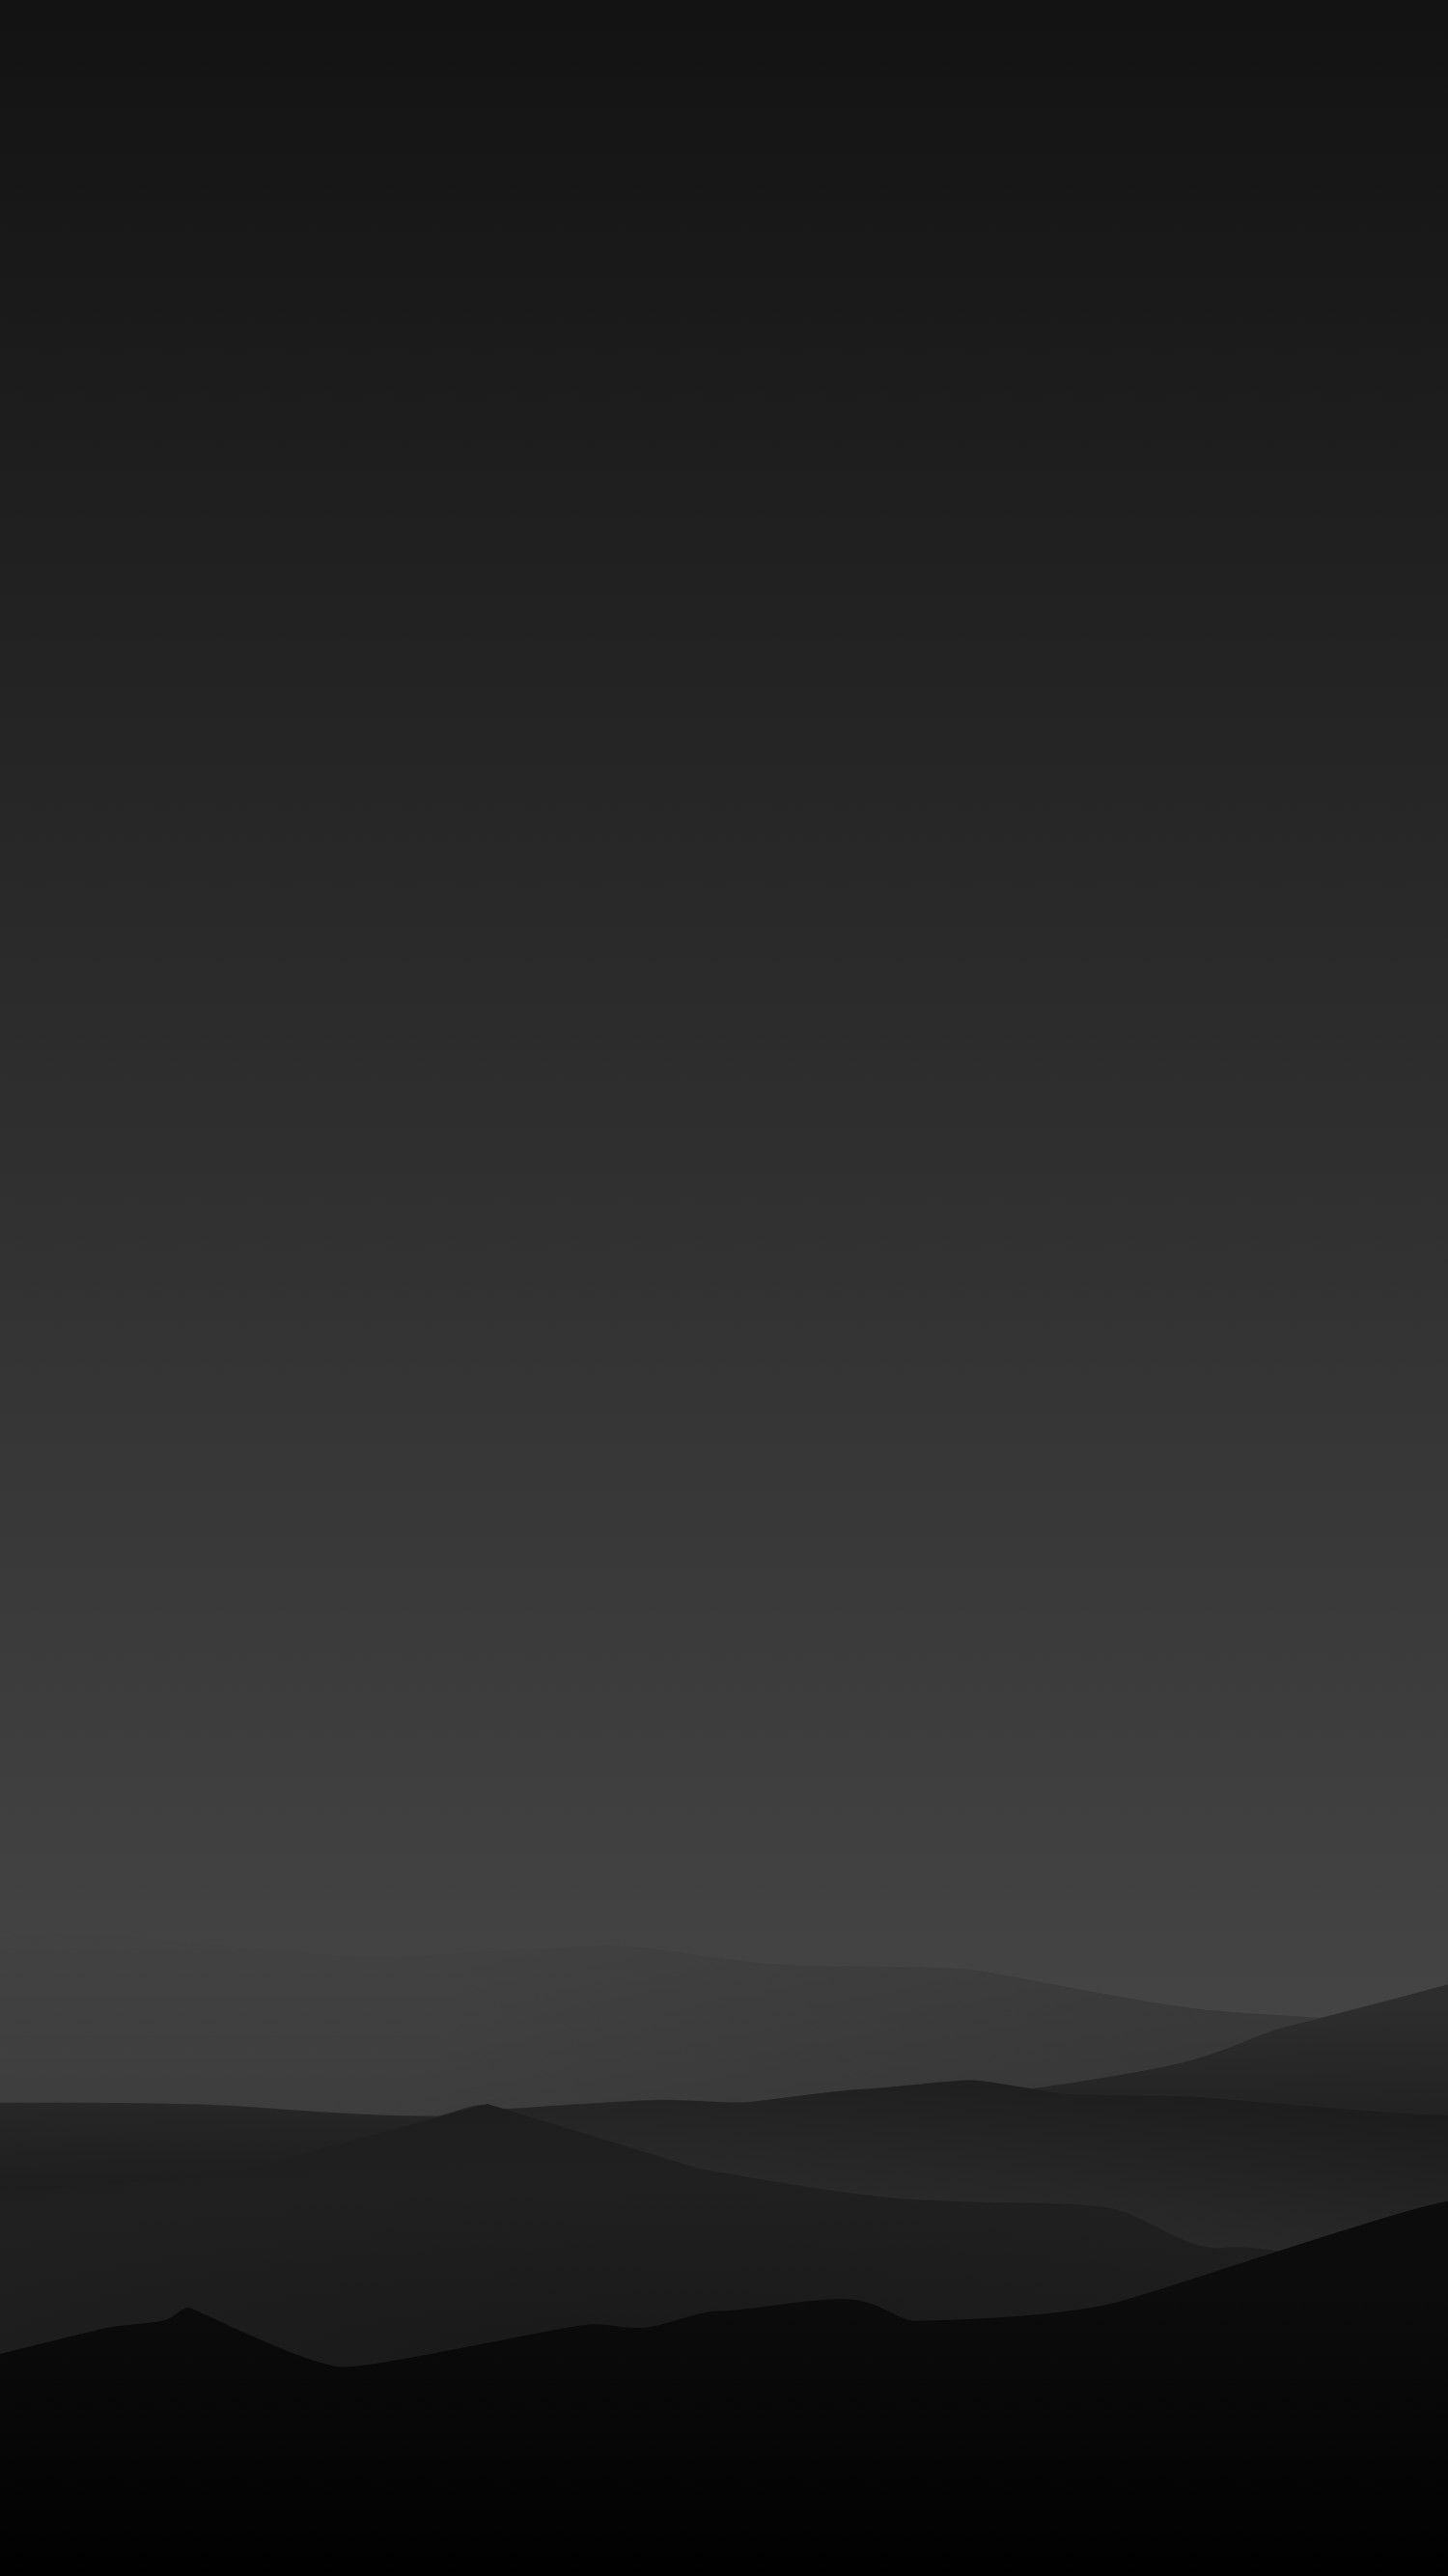 Dark Grey Iphone Wallpapers Top Free Dark Grey Iphone Backgrounds Wallpaperaccess